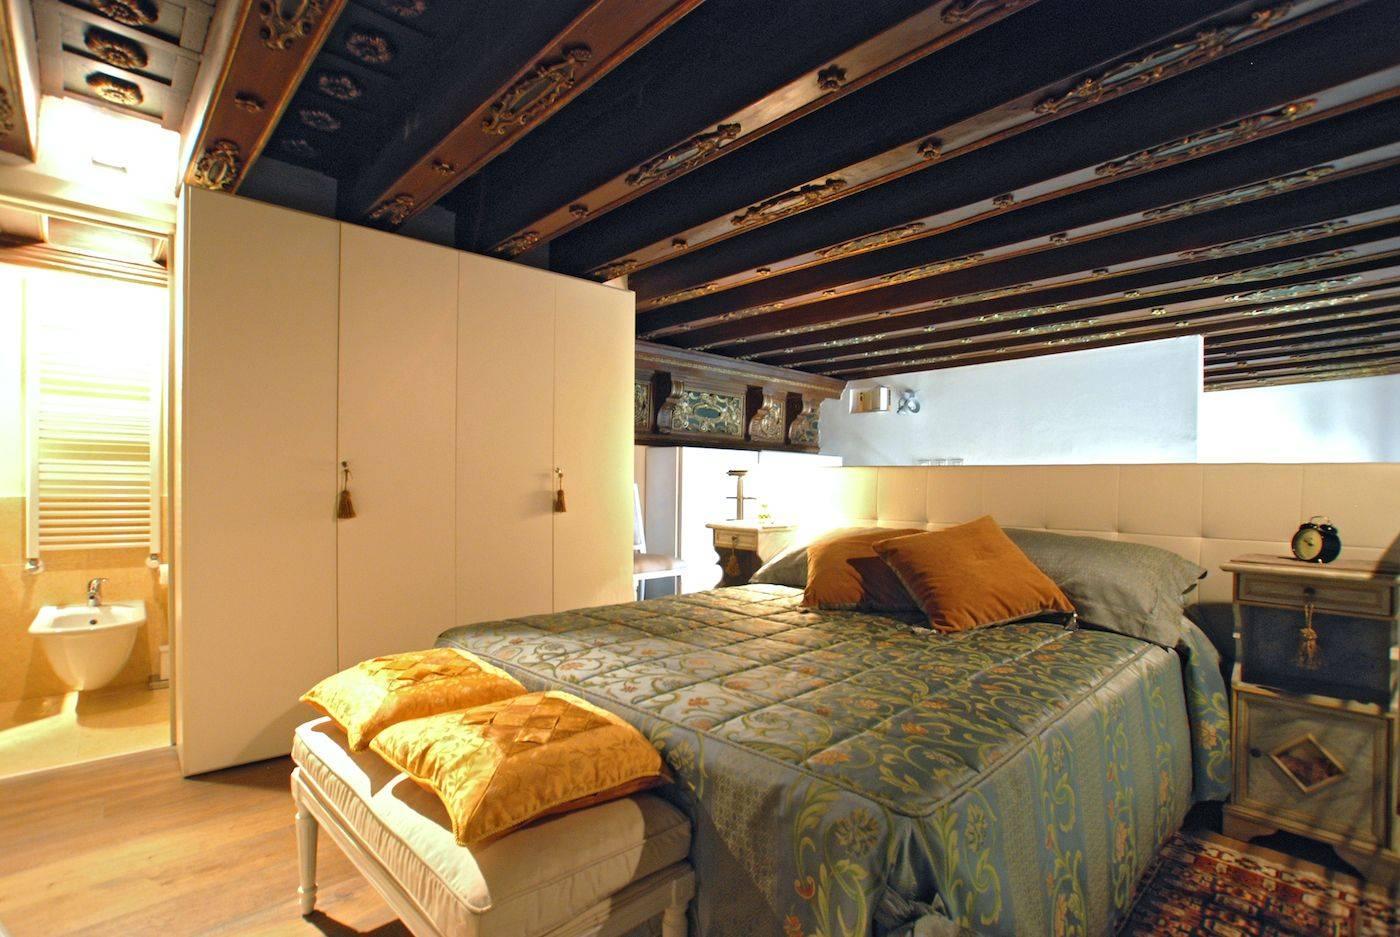 double bedroom with plenty of wardrobe space and en-suite bathroom